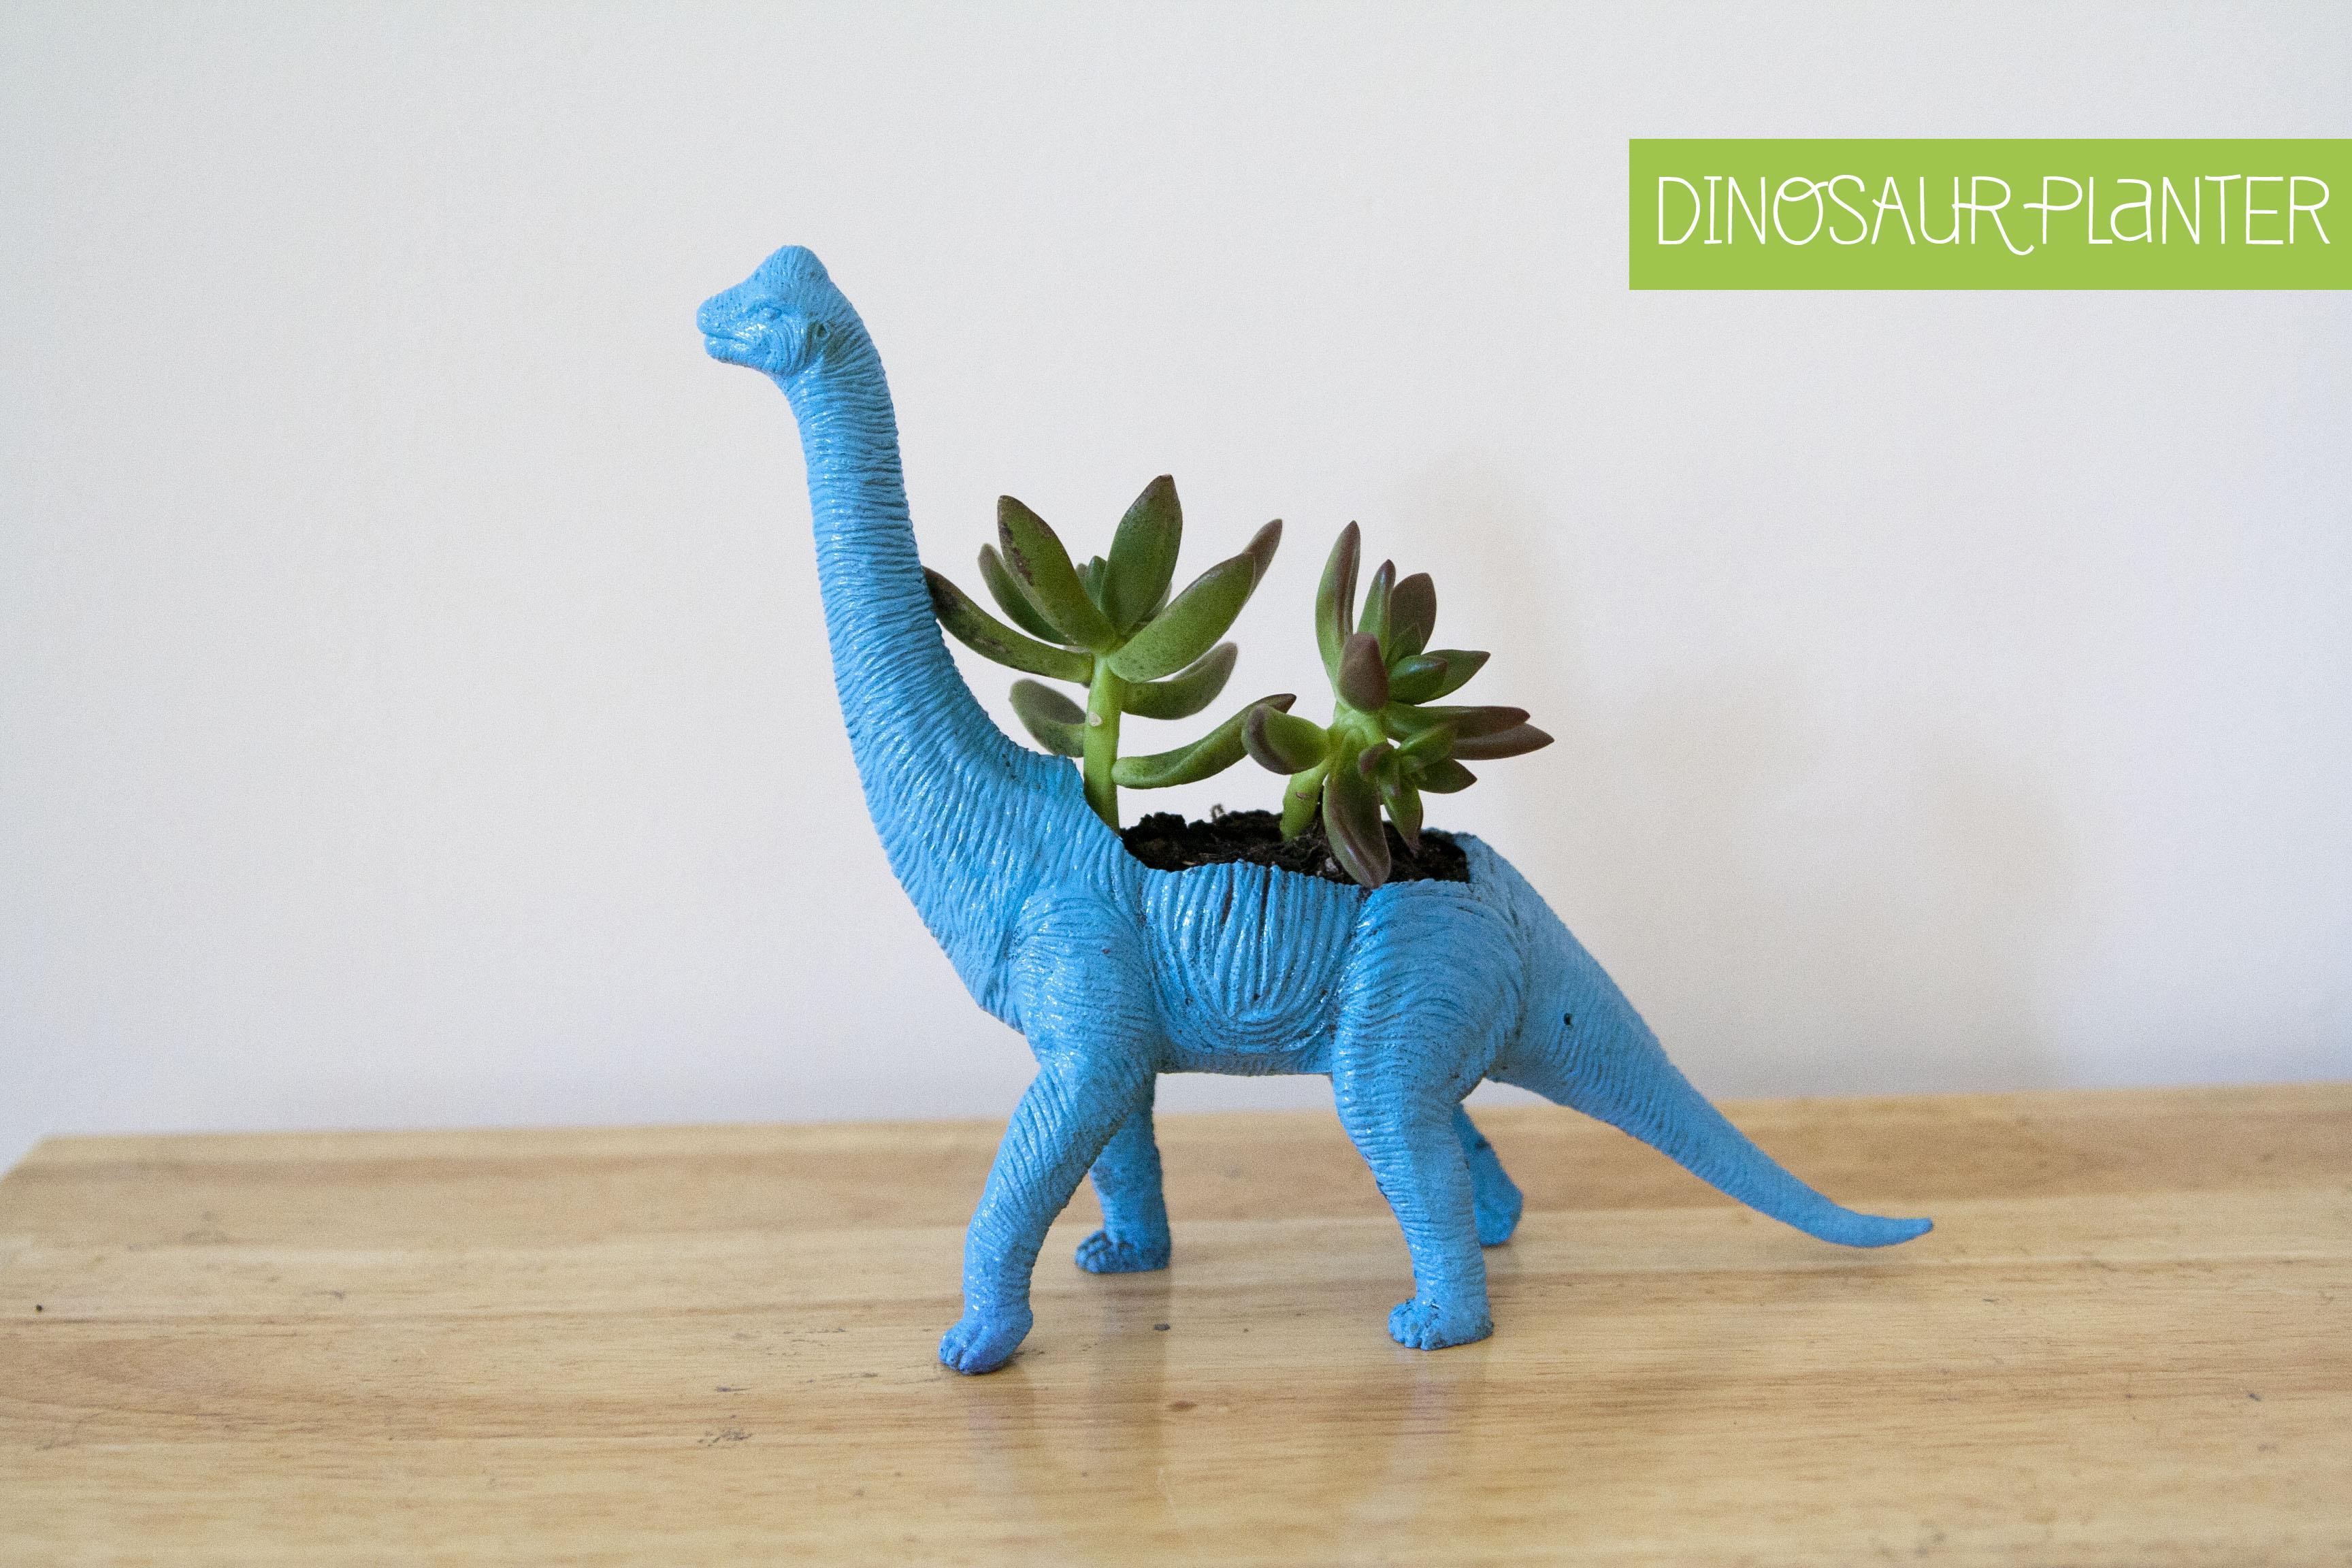 163 Dinosaur Planter Make Great